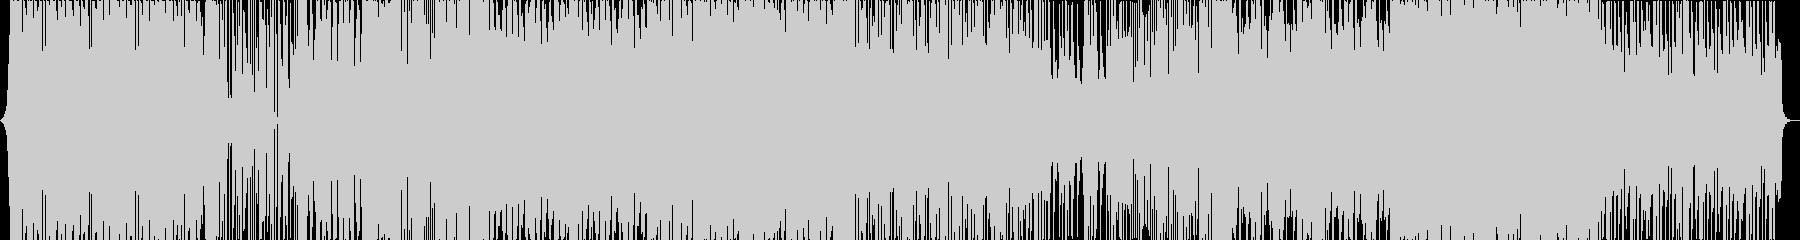 FPS動画で使えそうなムーンバートンの未再生の波形